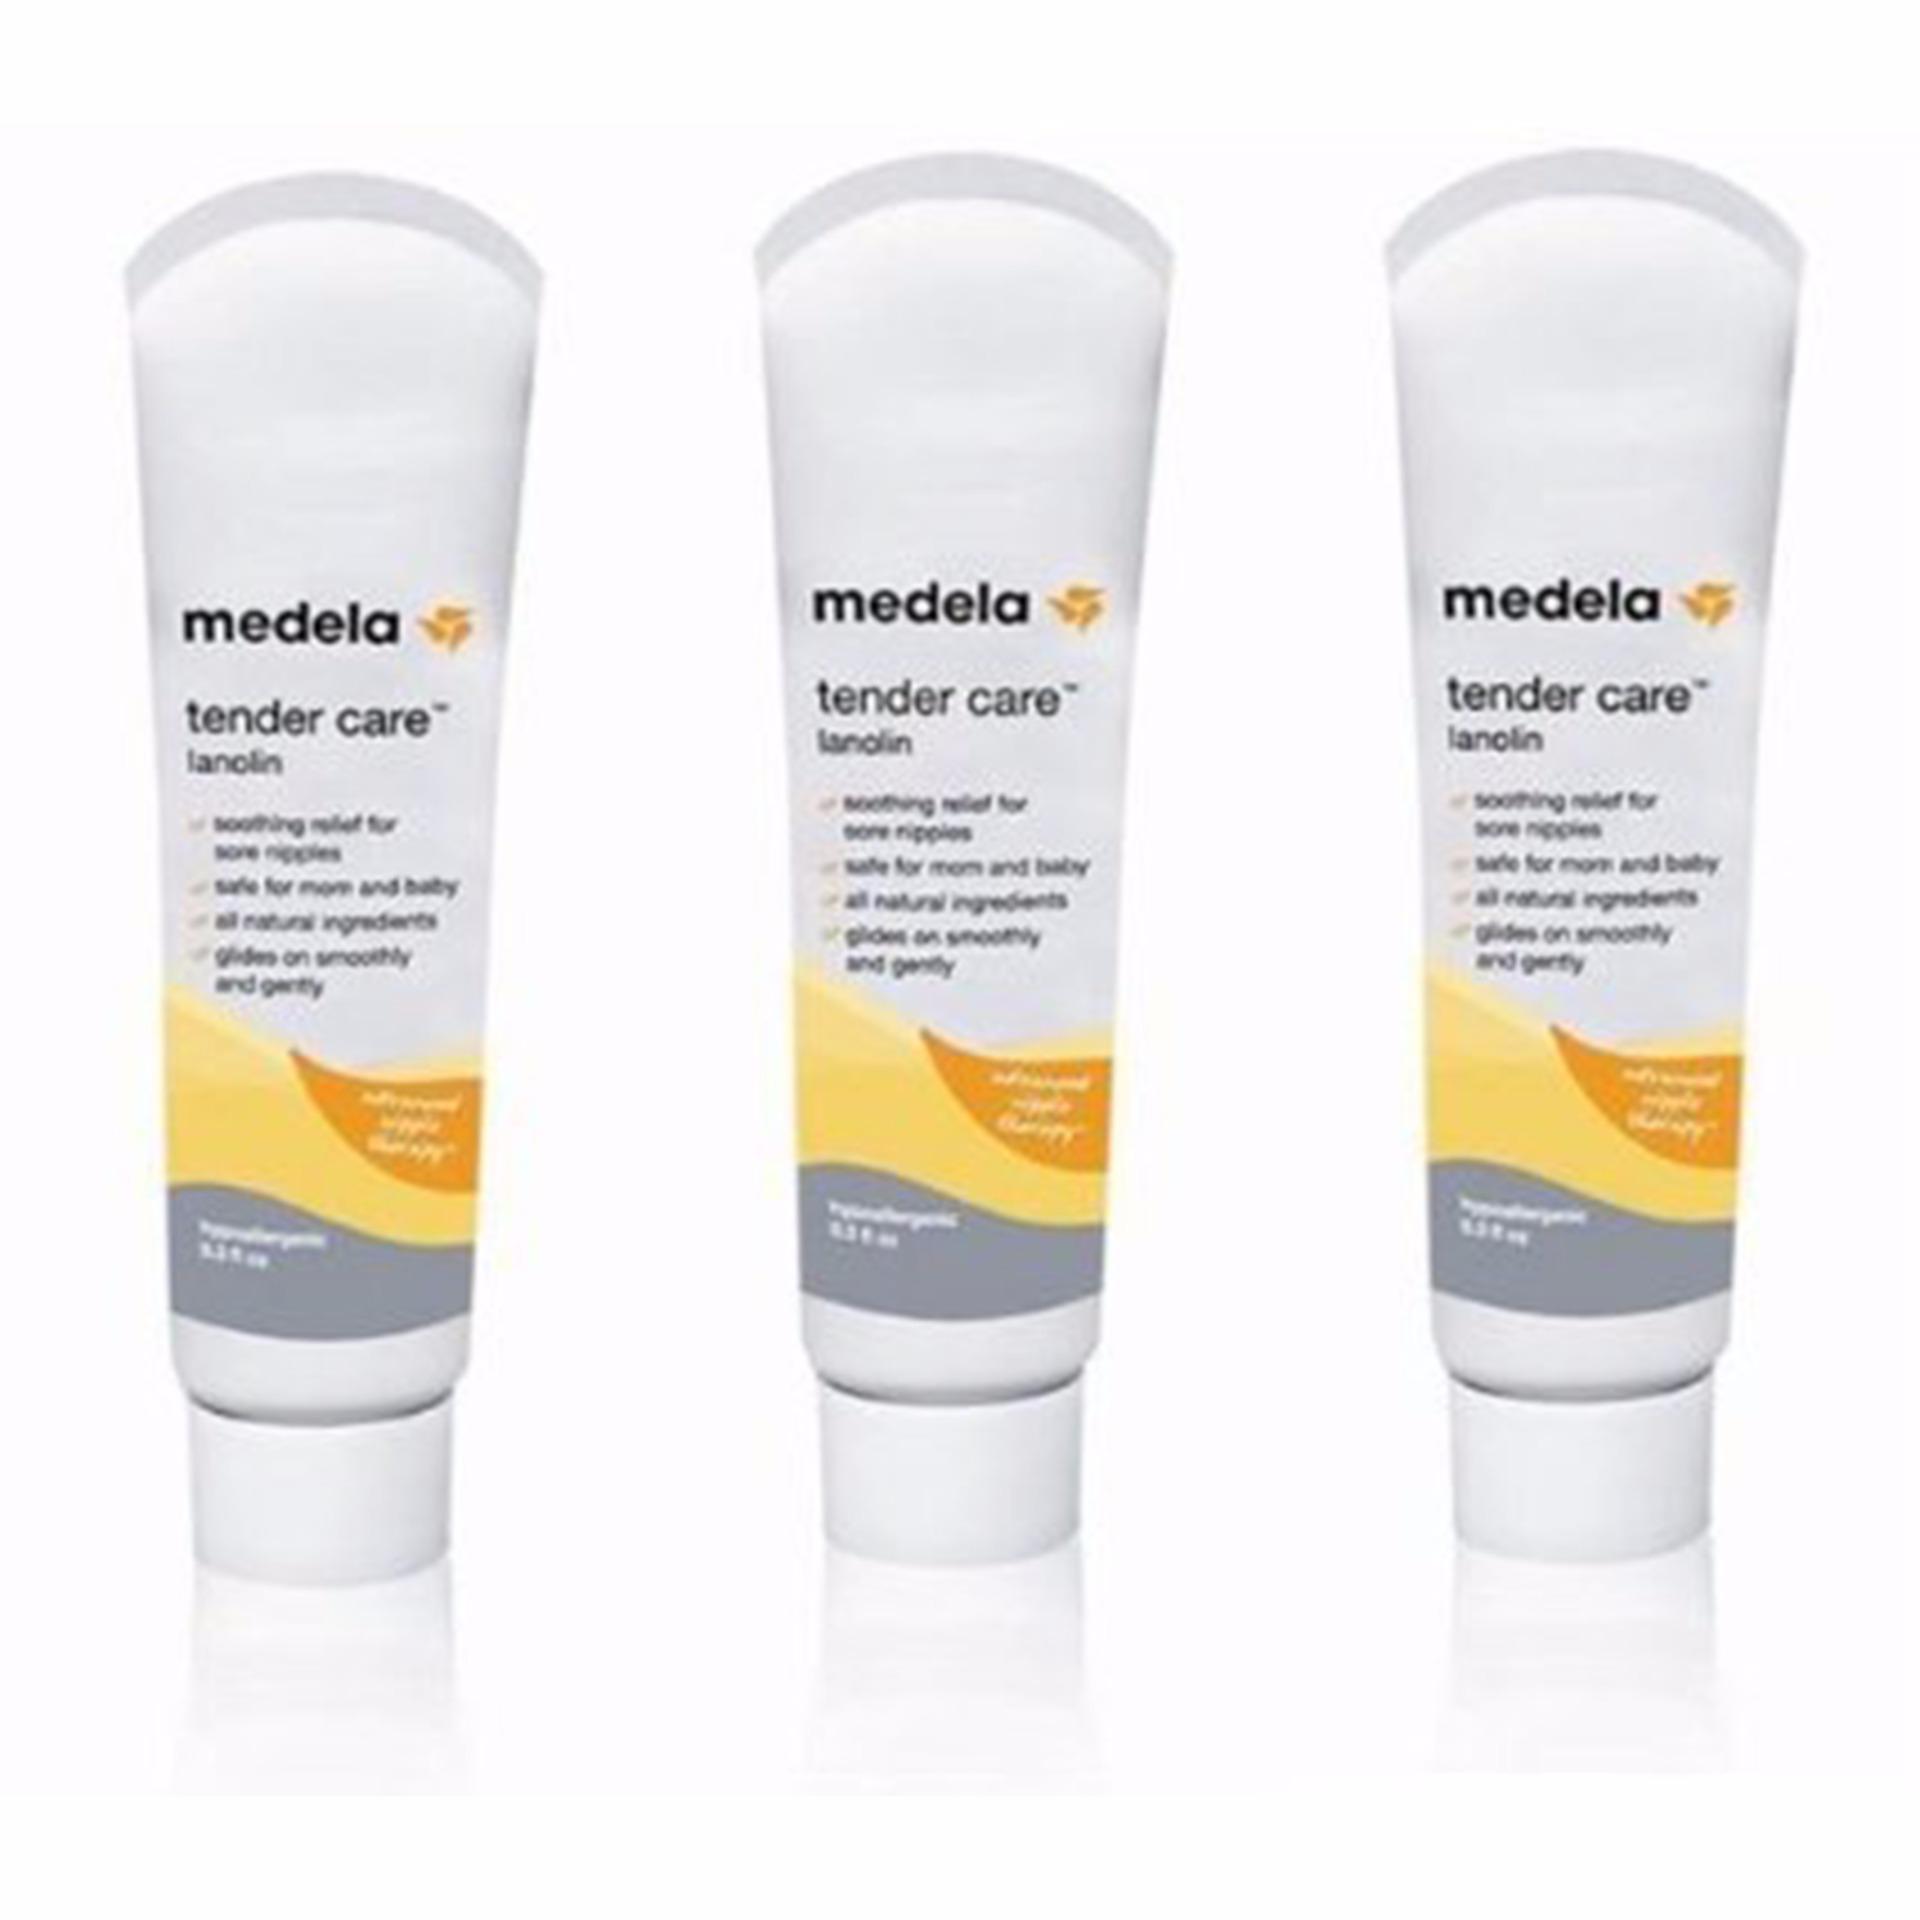 Bộ 3 tuýp kem bôi đầu ti Medela tender care 8.8ml (Vàng)